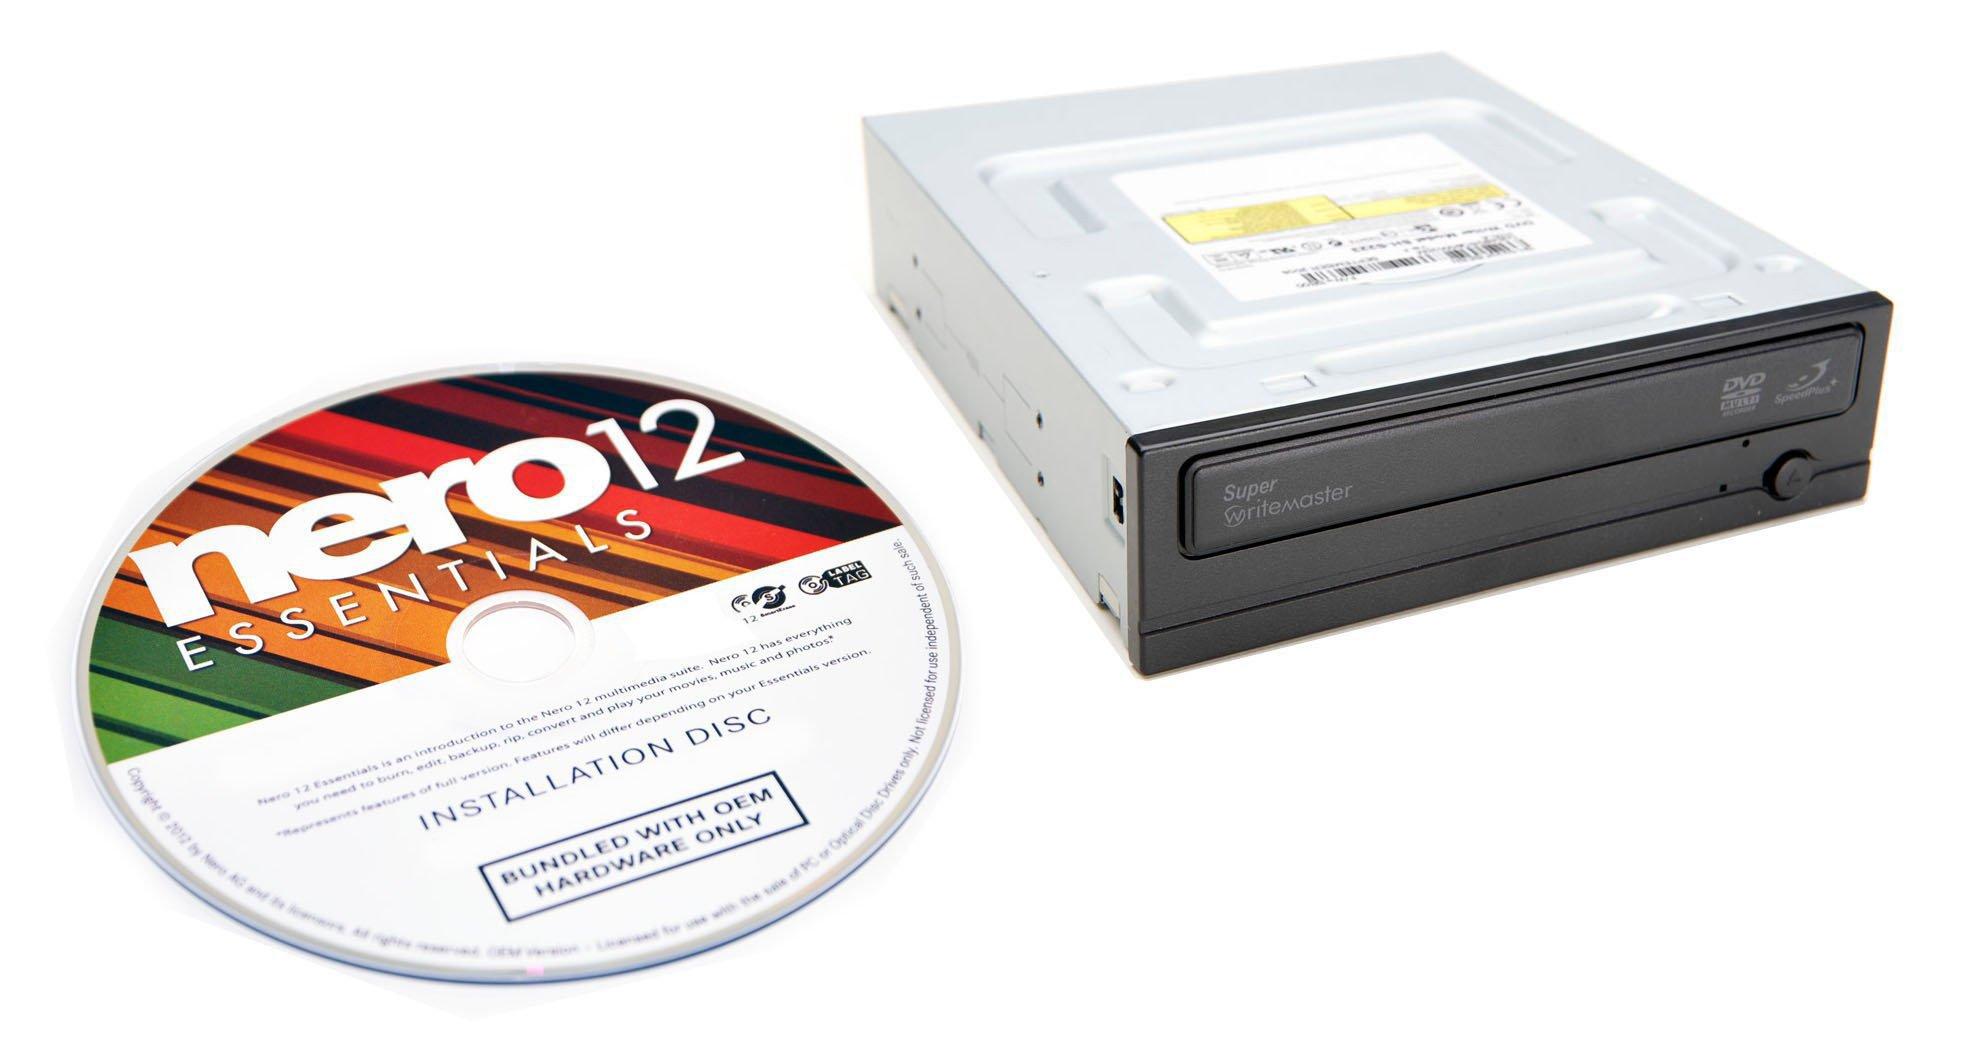 Bestduplicator Samsung 24x SATA masterizzatore DVD interno Drive sh-224db/bebe Bulk + nero Multimed